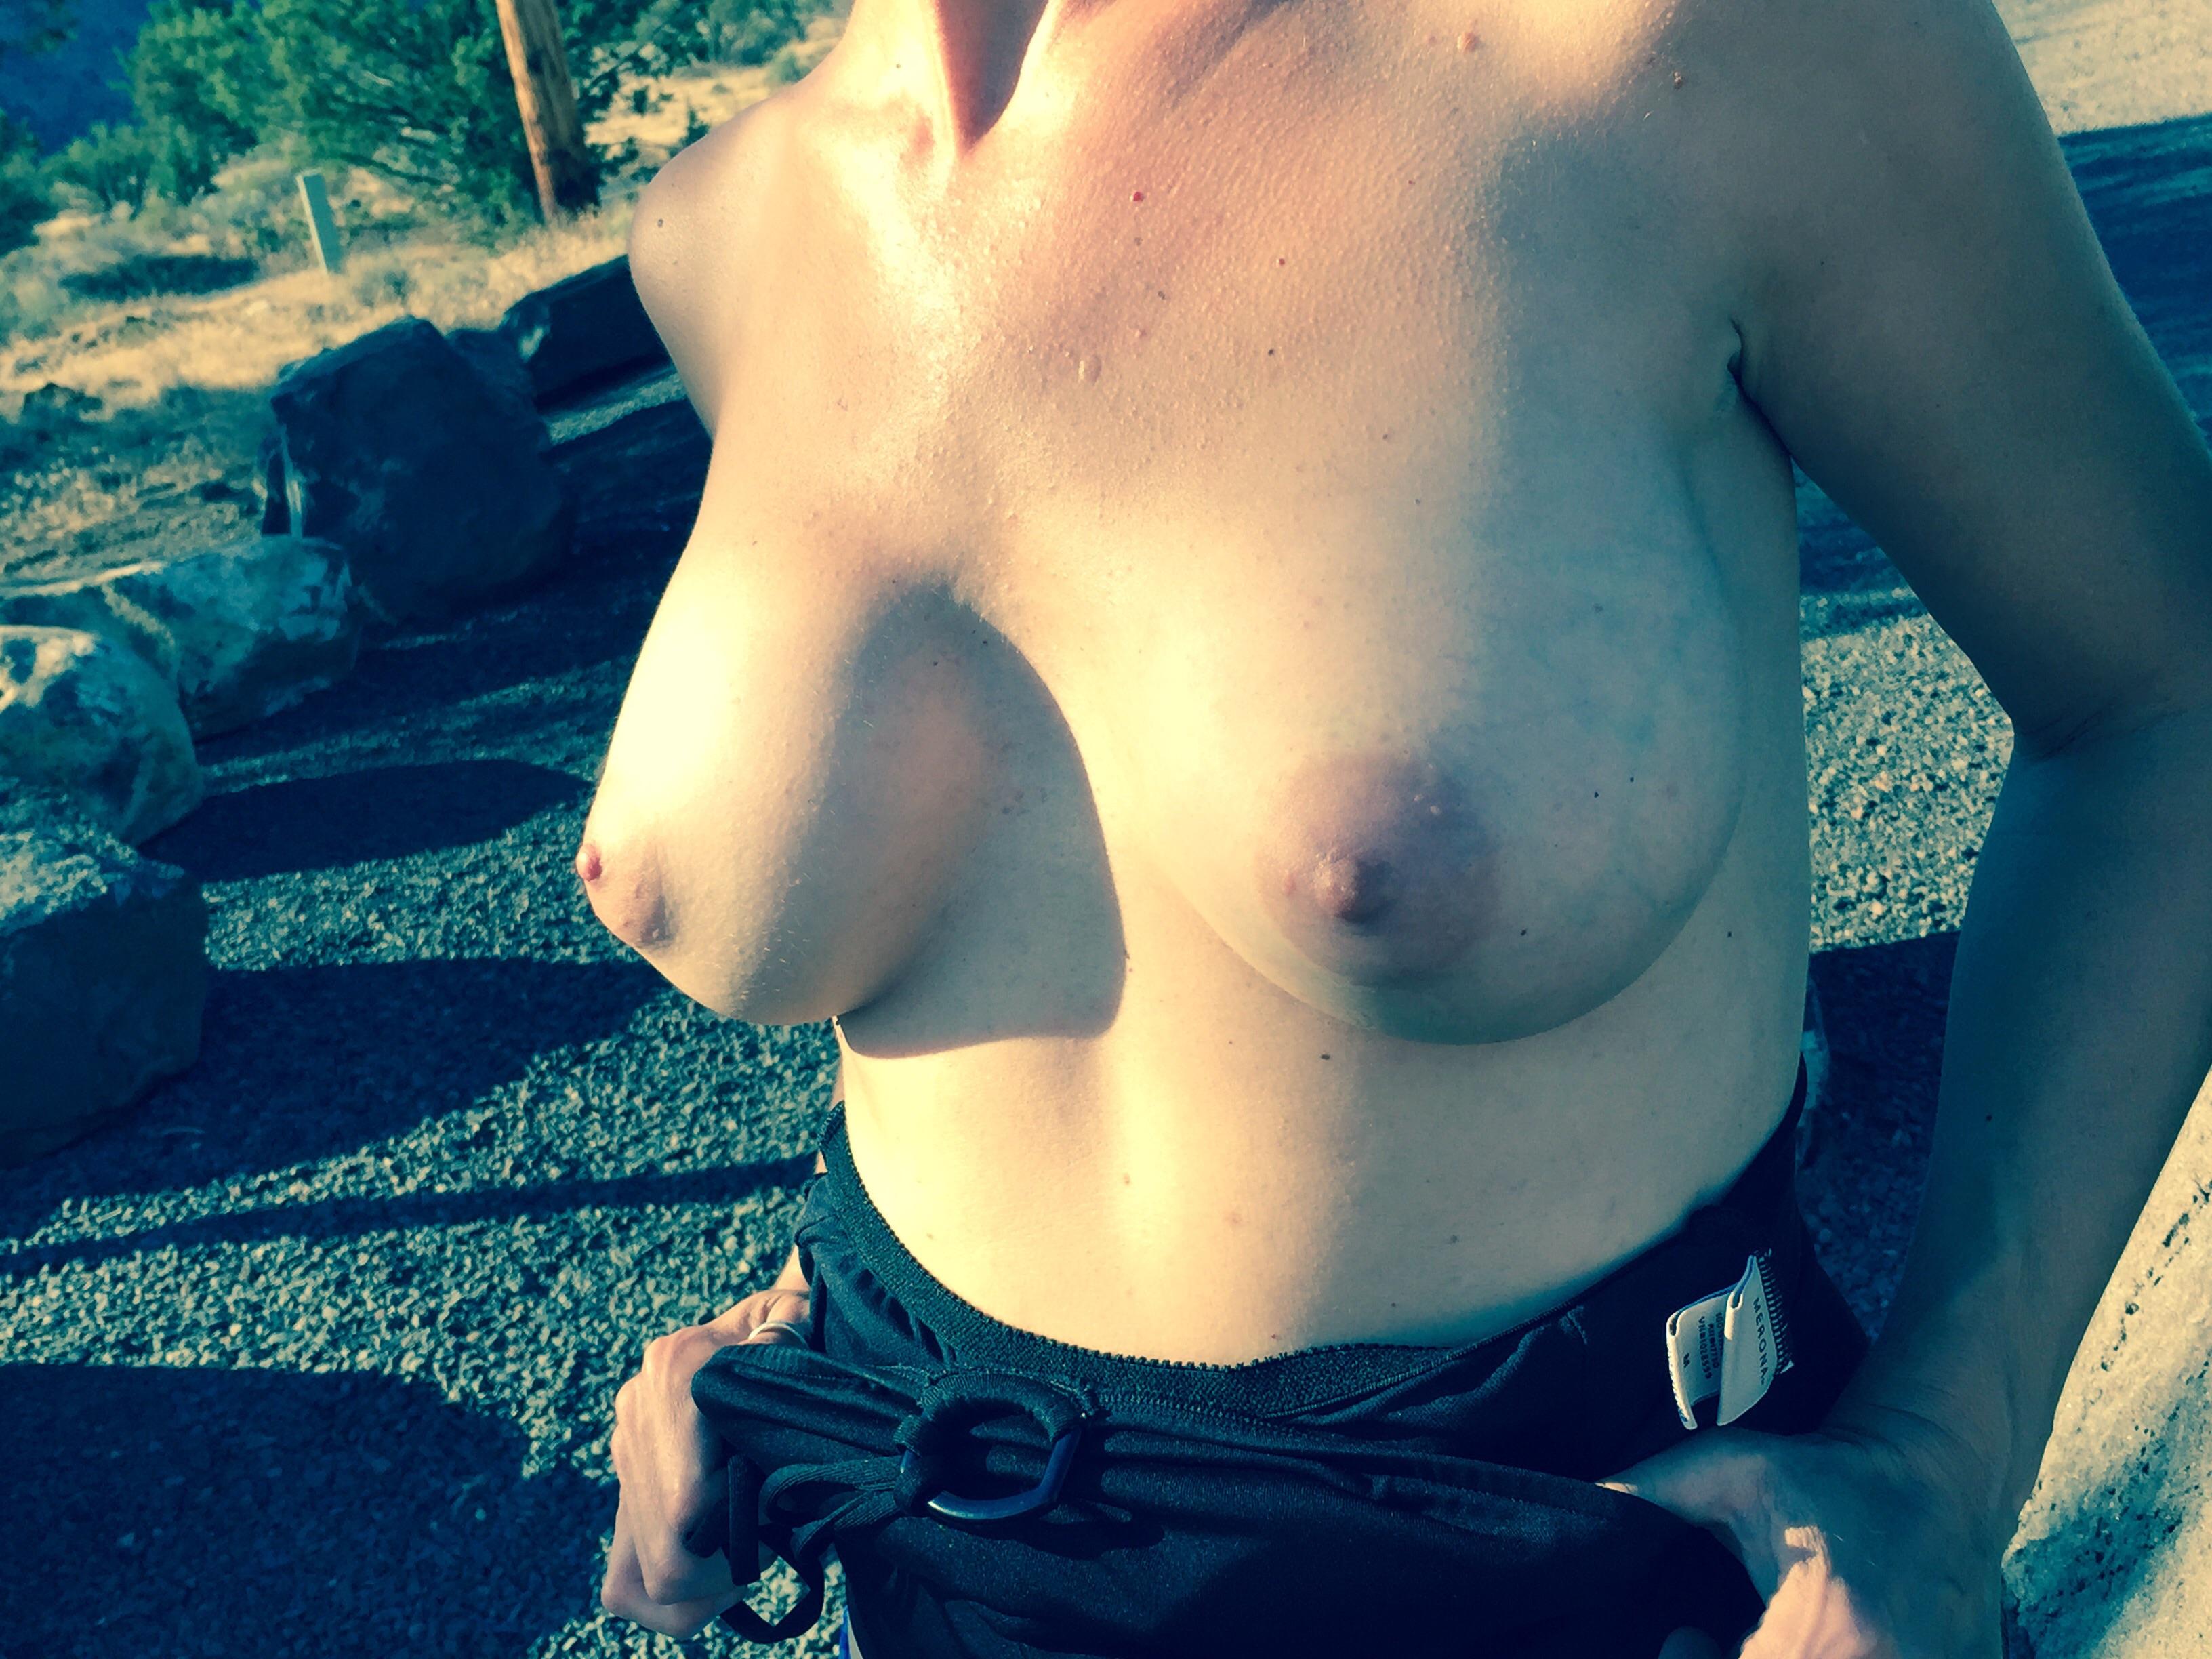 Wife Flashing Her Tits